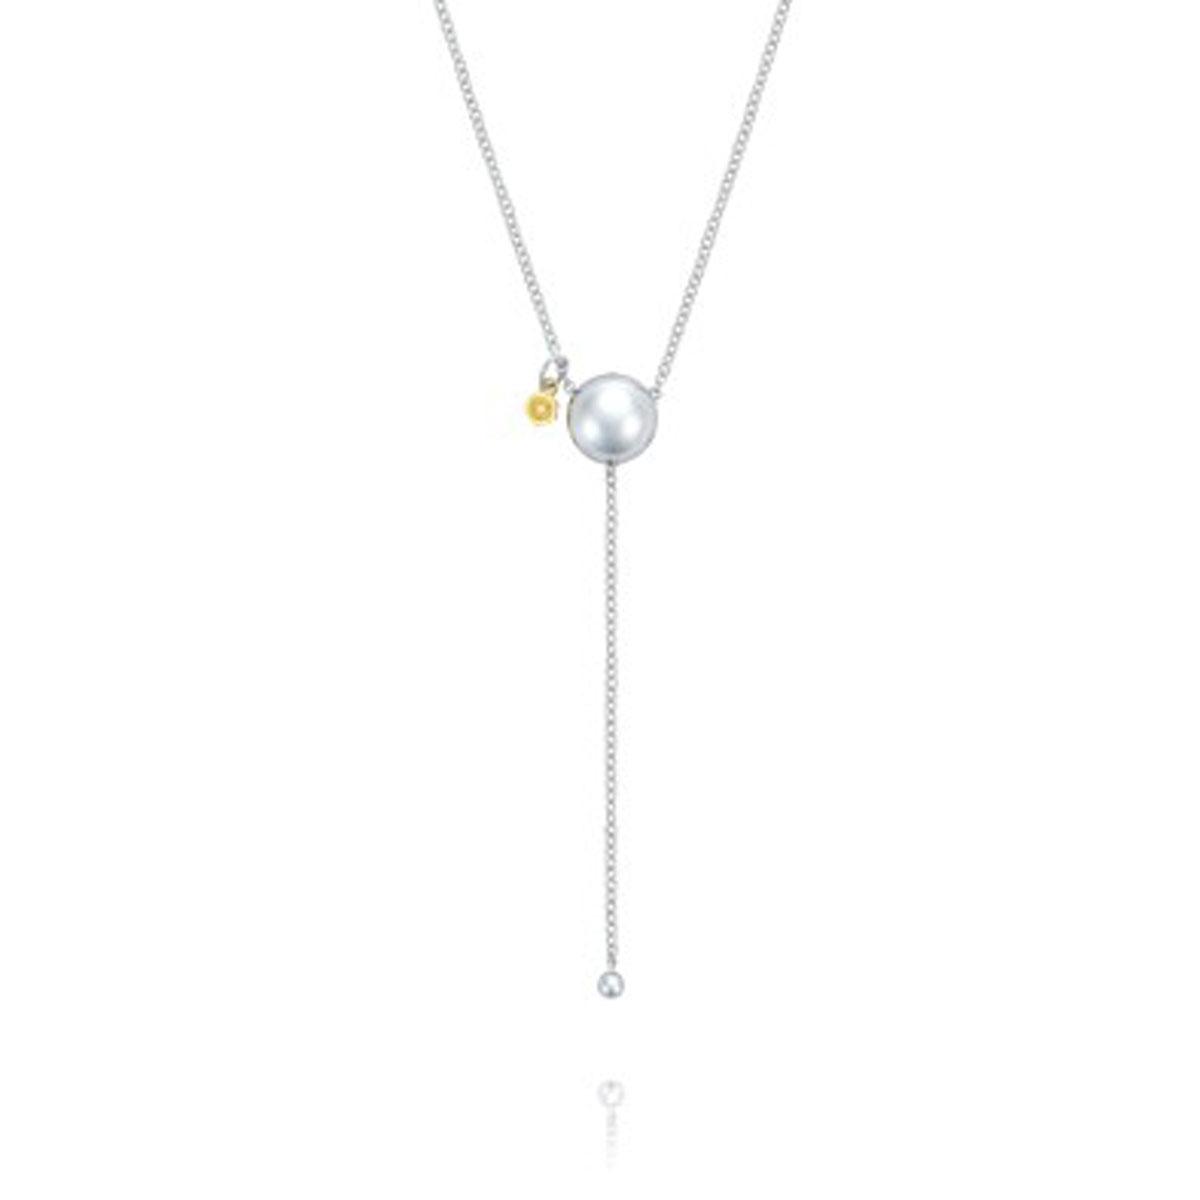 Tacori Sonoma Mist SN212 Silver Dew Drop Lariat Necklace